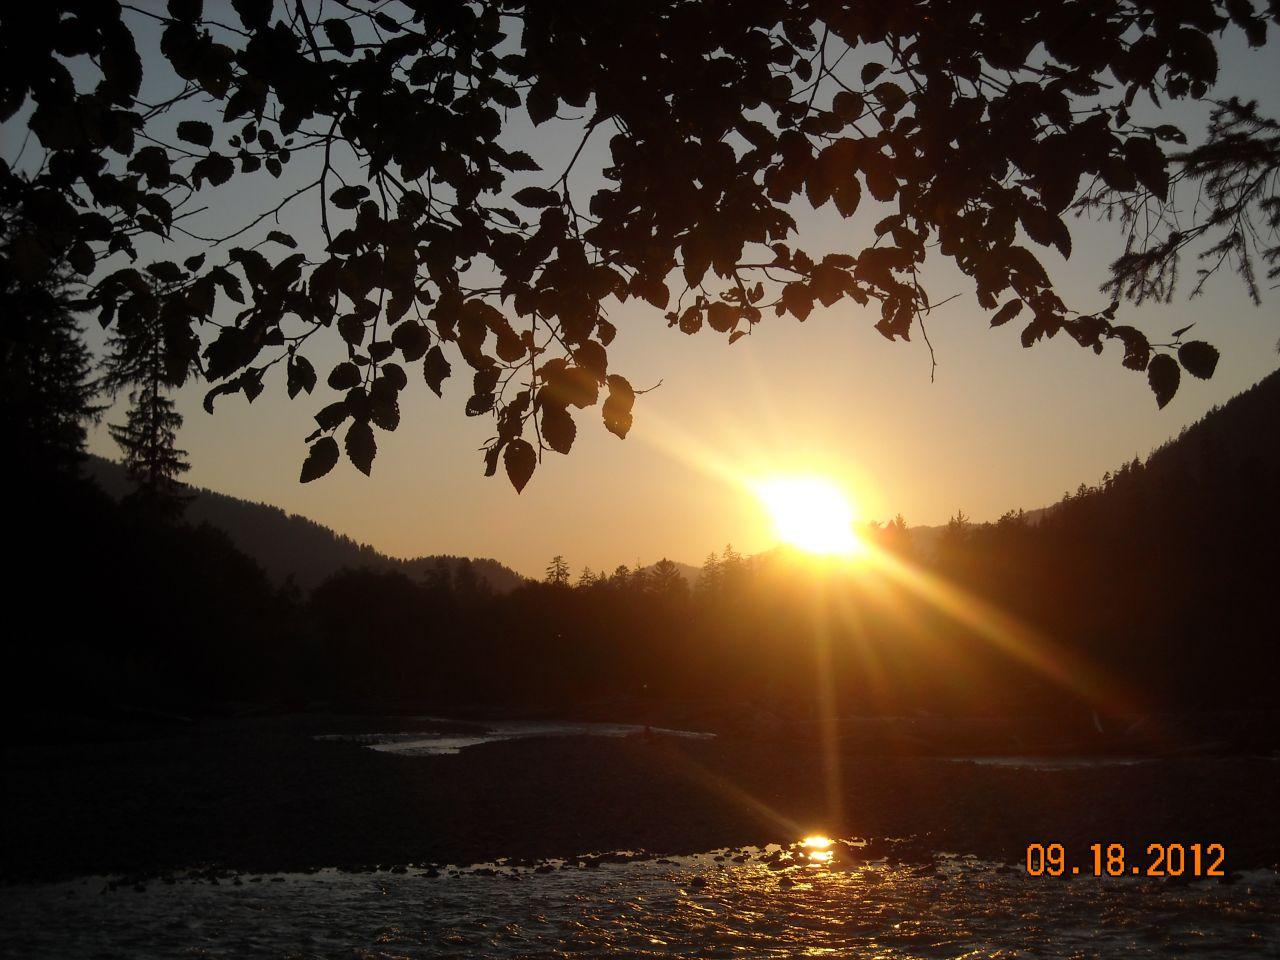 Hoh River Onp 2012